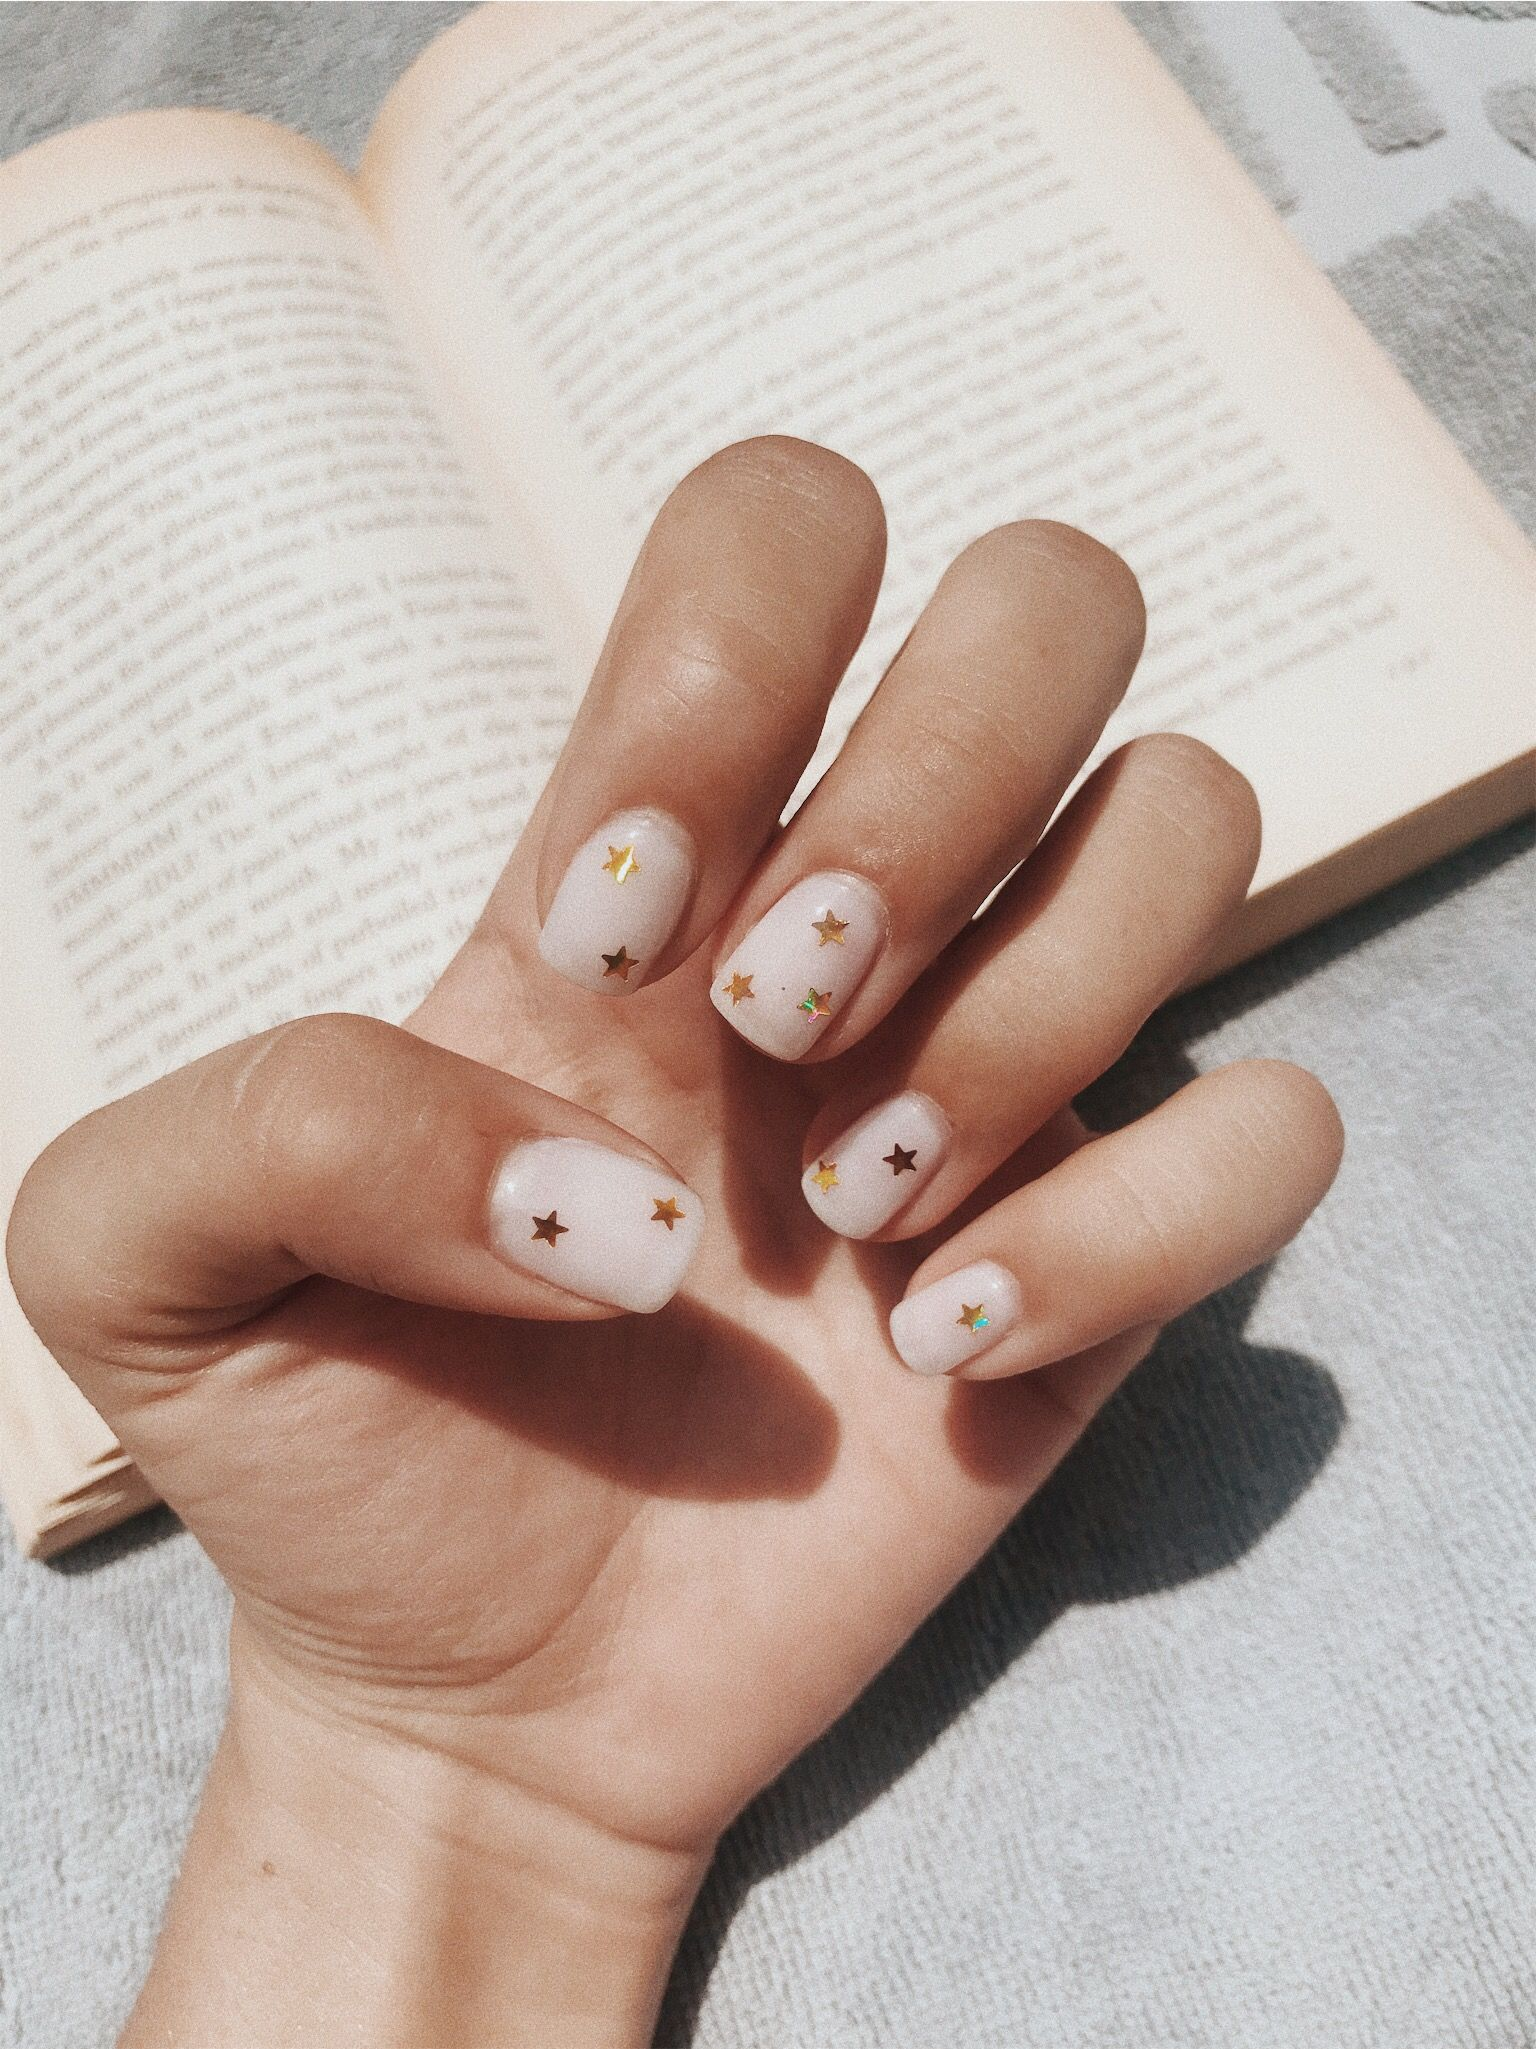 Vsco Maggielento Classy Nails Classy Nail Art Manicure